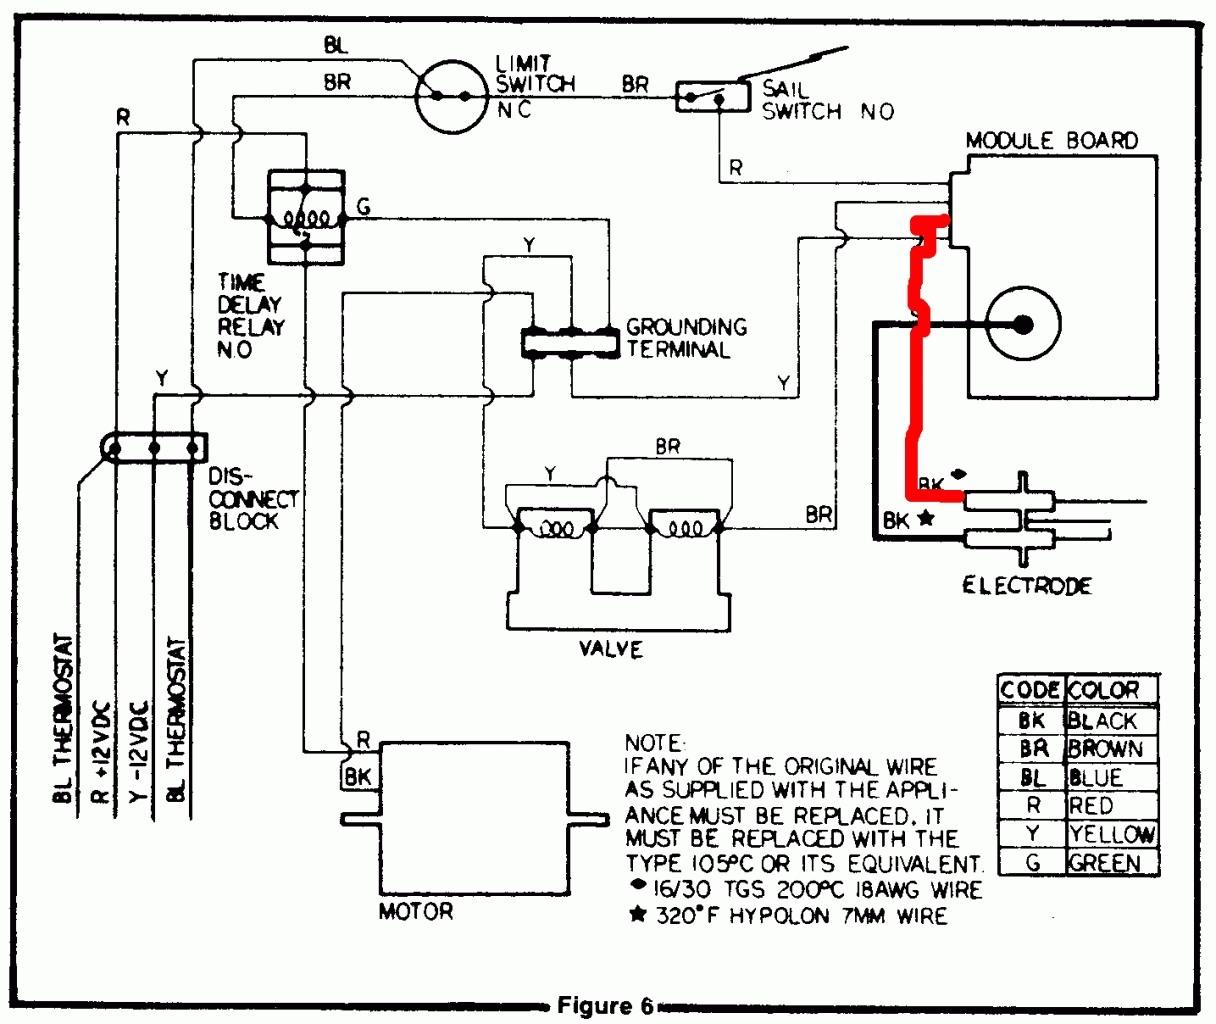 rv furnace wiring qbm yogaundstille de \u2022 Carrier Thermostat Wiring Colors suburban sw6de wiring diagram all wiring diagram rh 3 7 drk ov roden de rv furnace wiring diagram atwood rv furnace wiring diagram